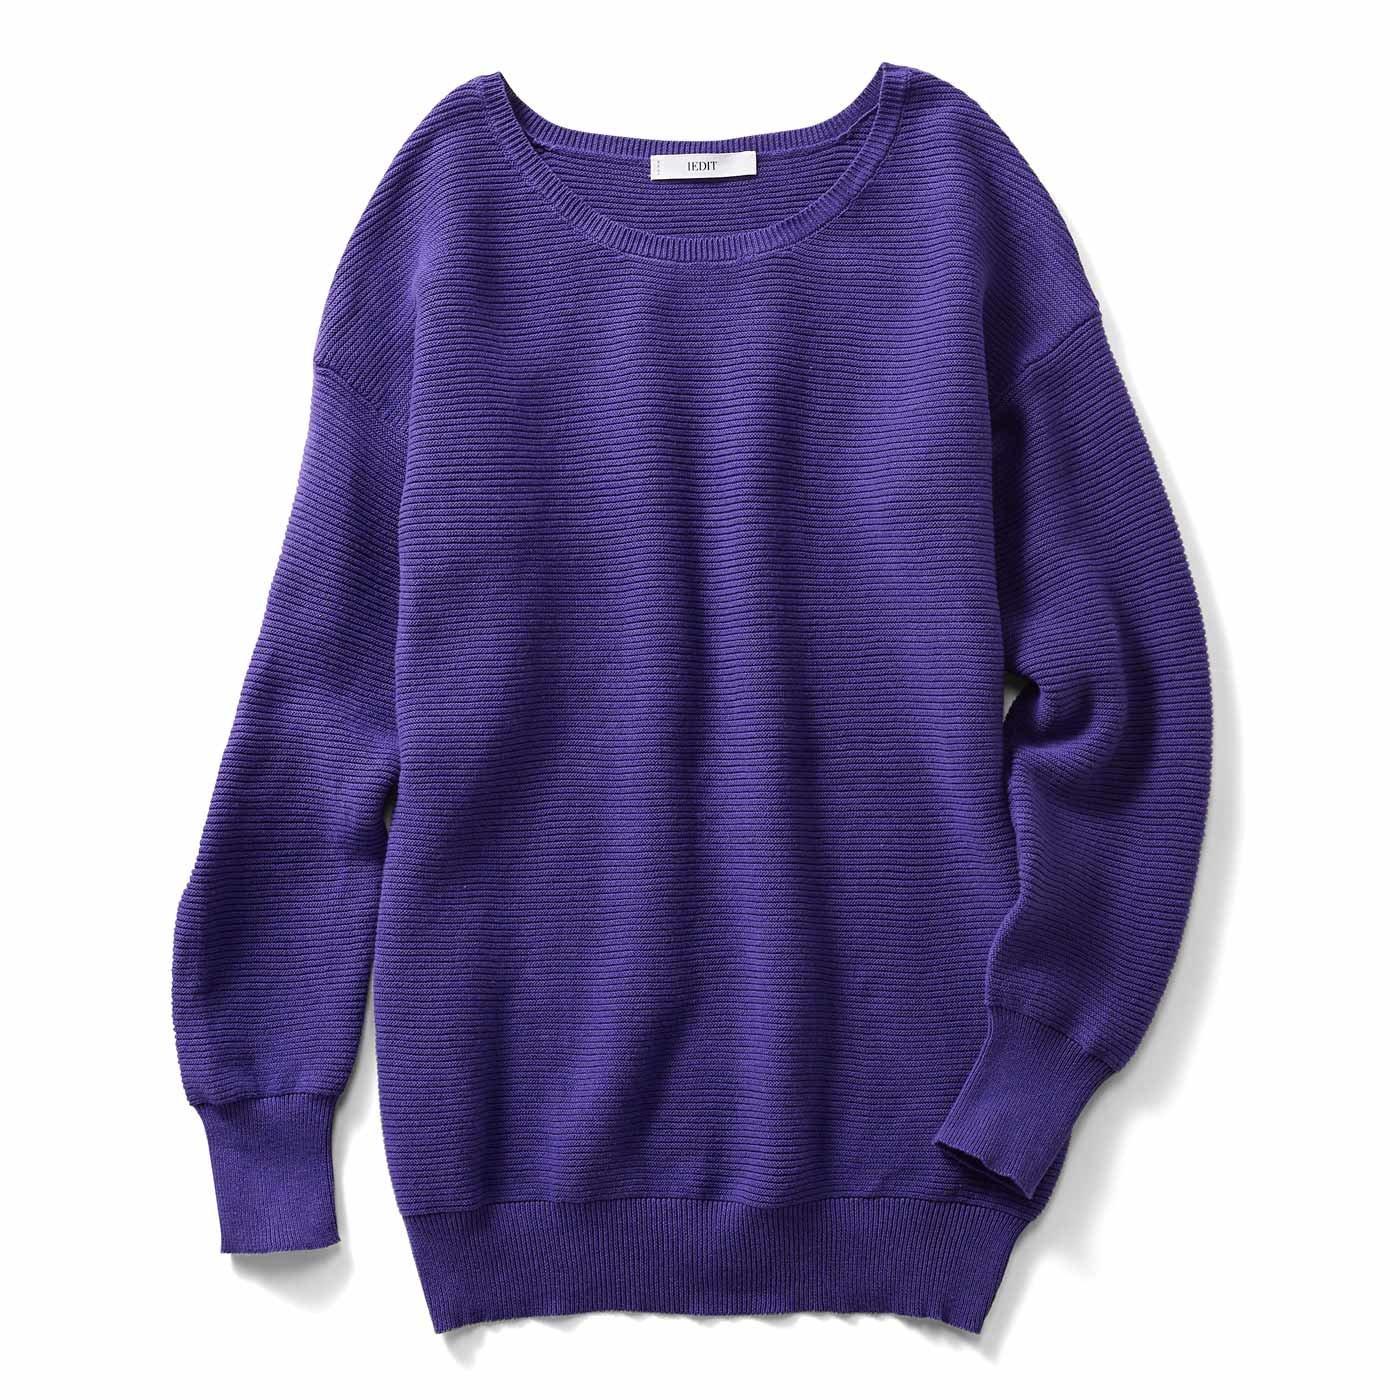 IEDIT[イディット] ガーター編みのコットンニット〈パープル〉